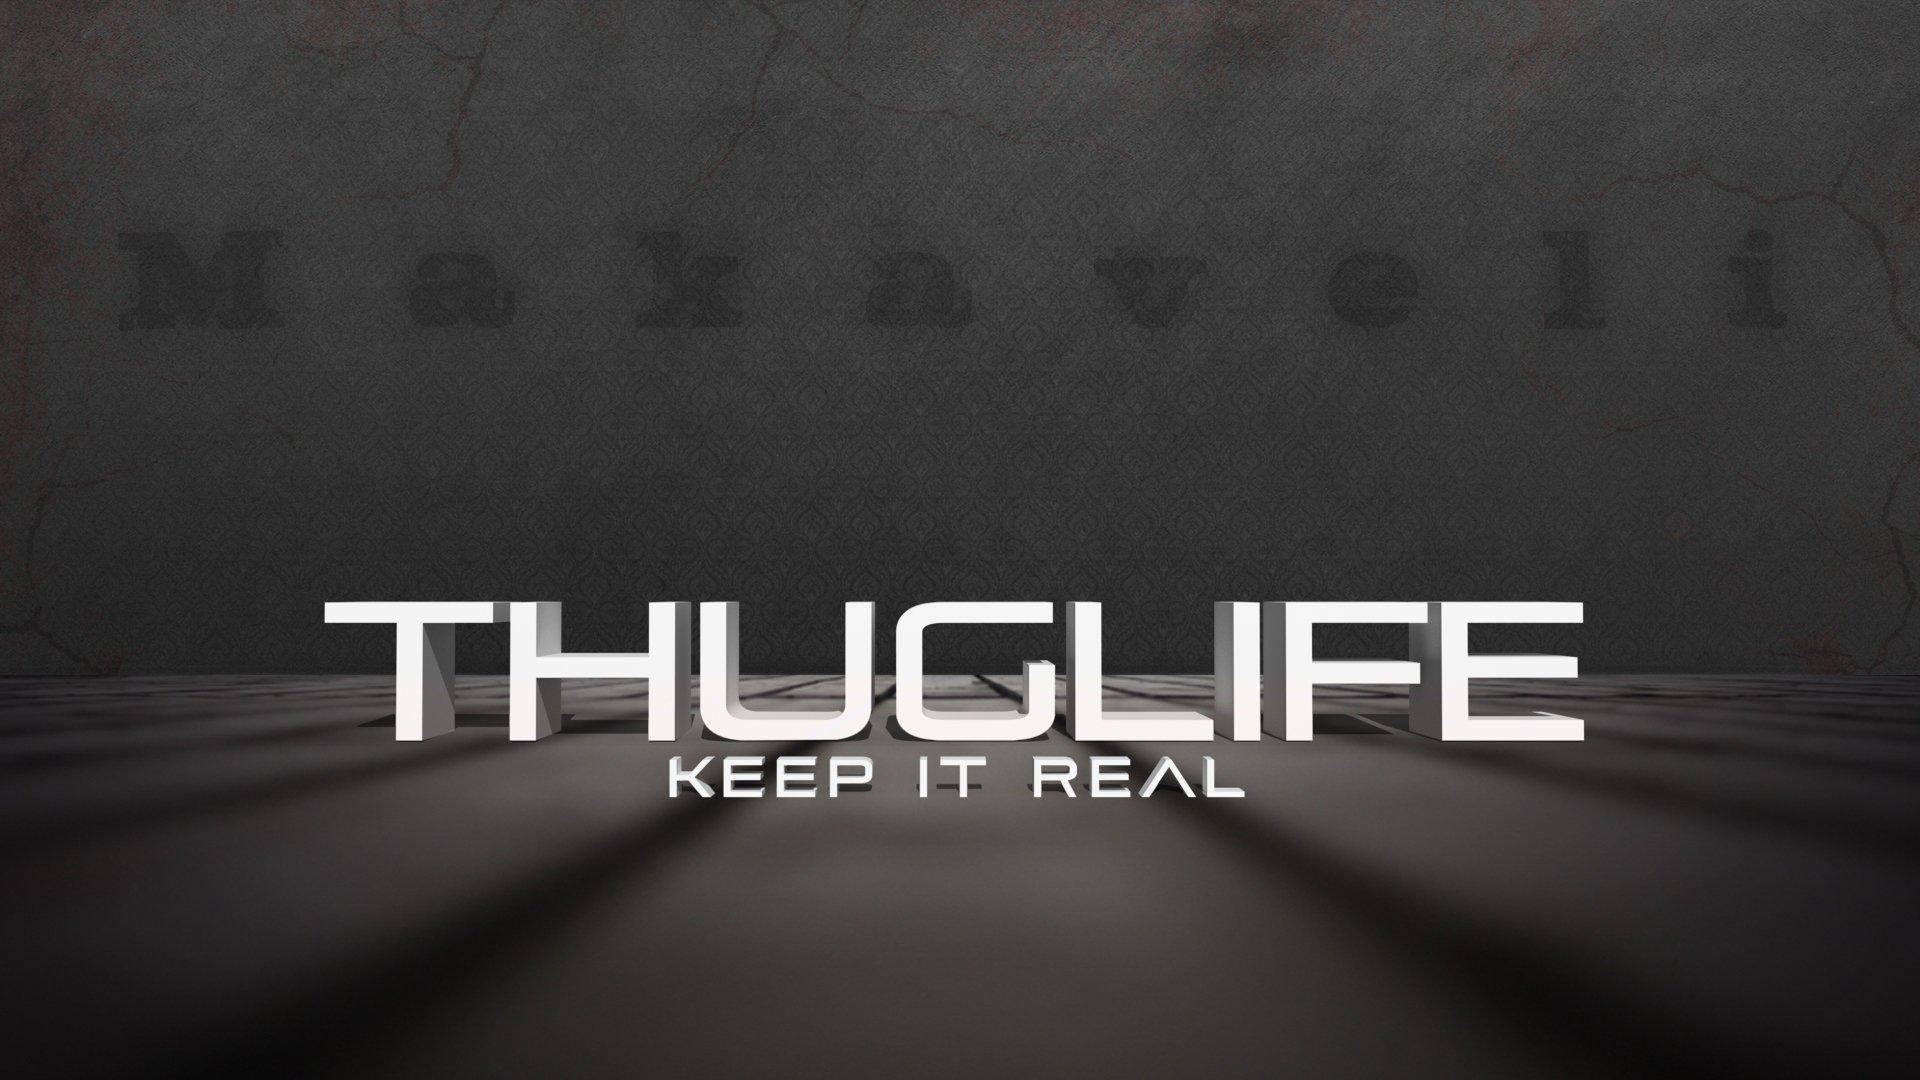 Tupac Shakur Thug Life Images TheCelebrityPix 1920x1080